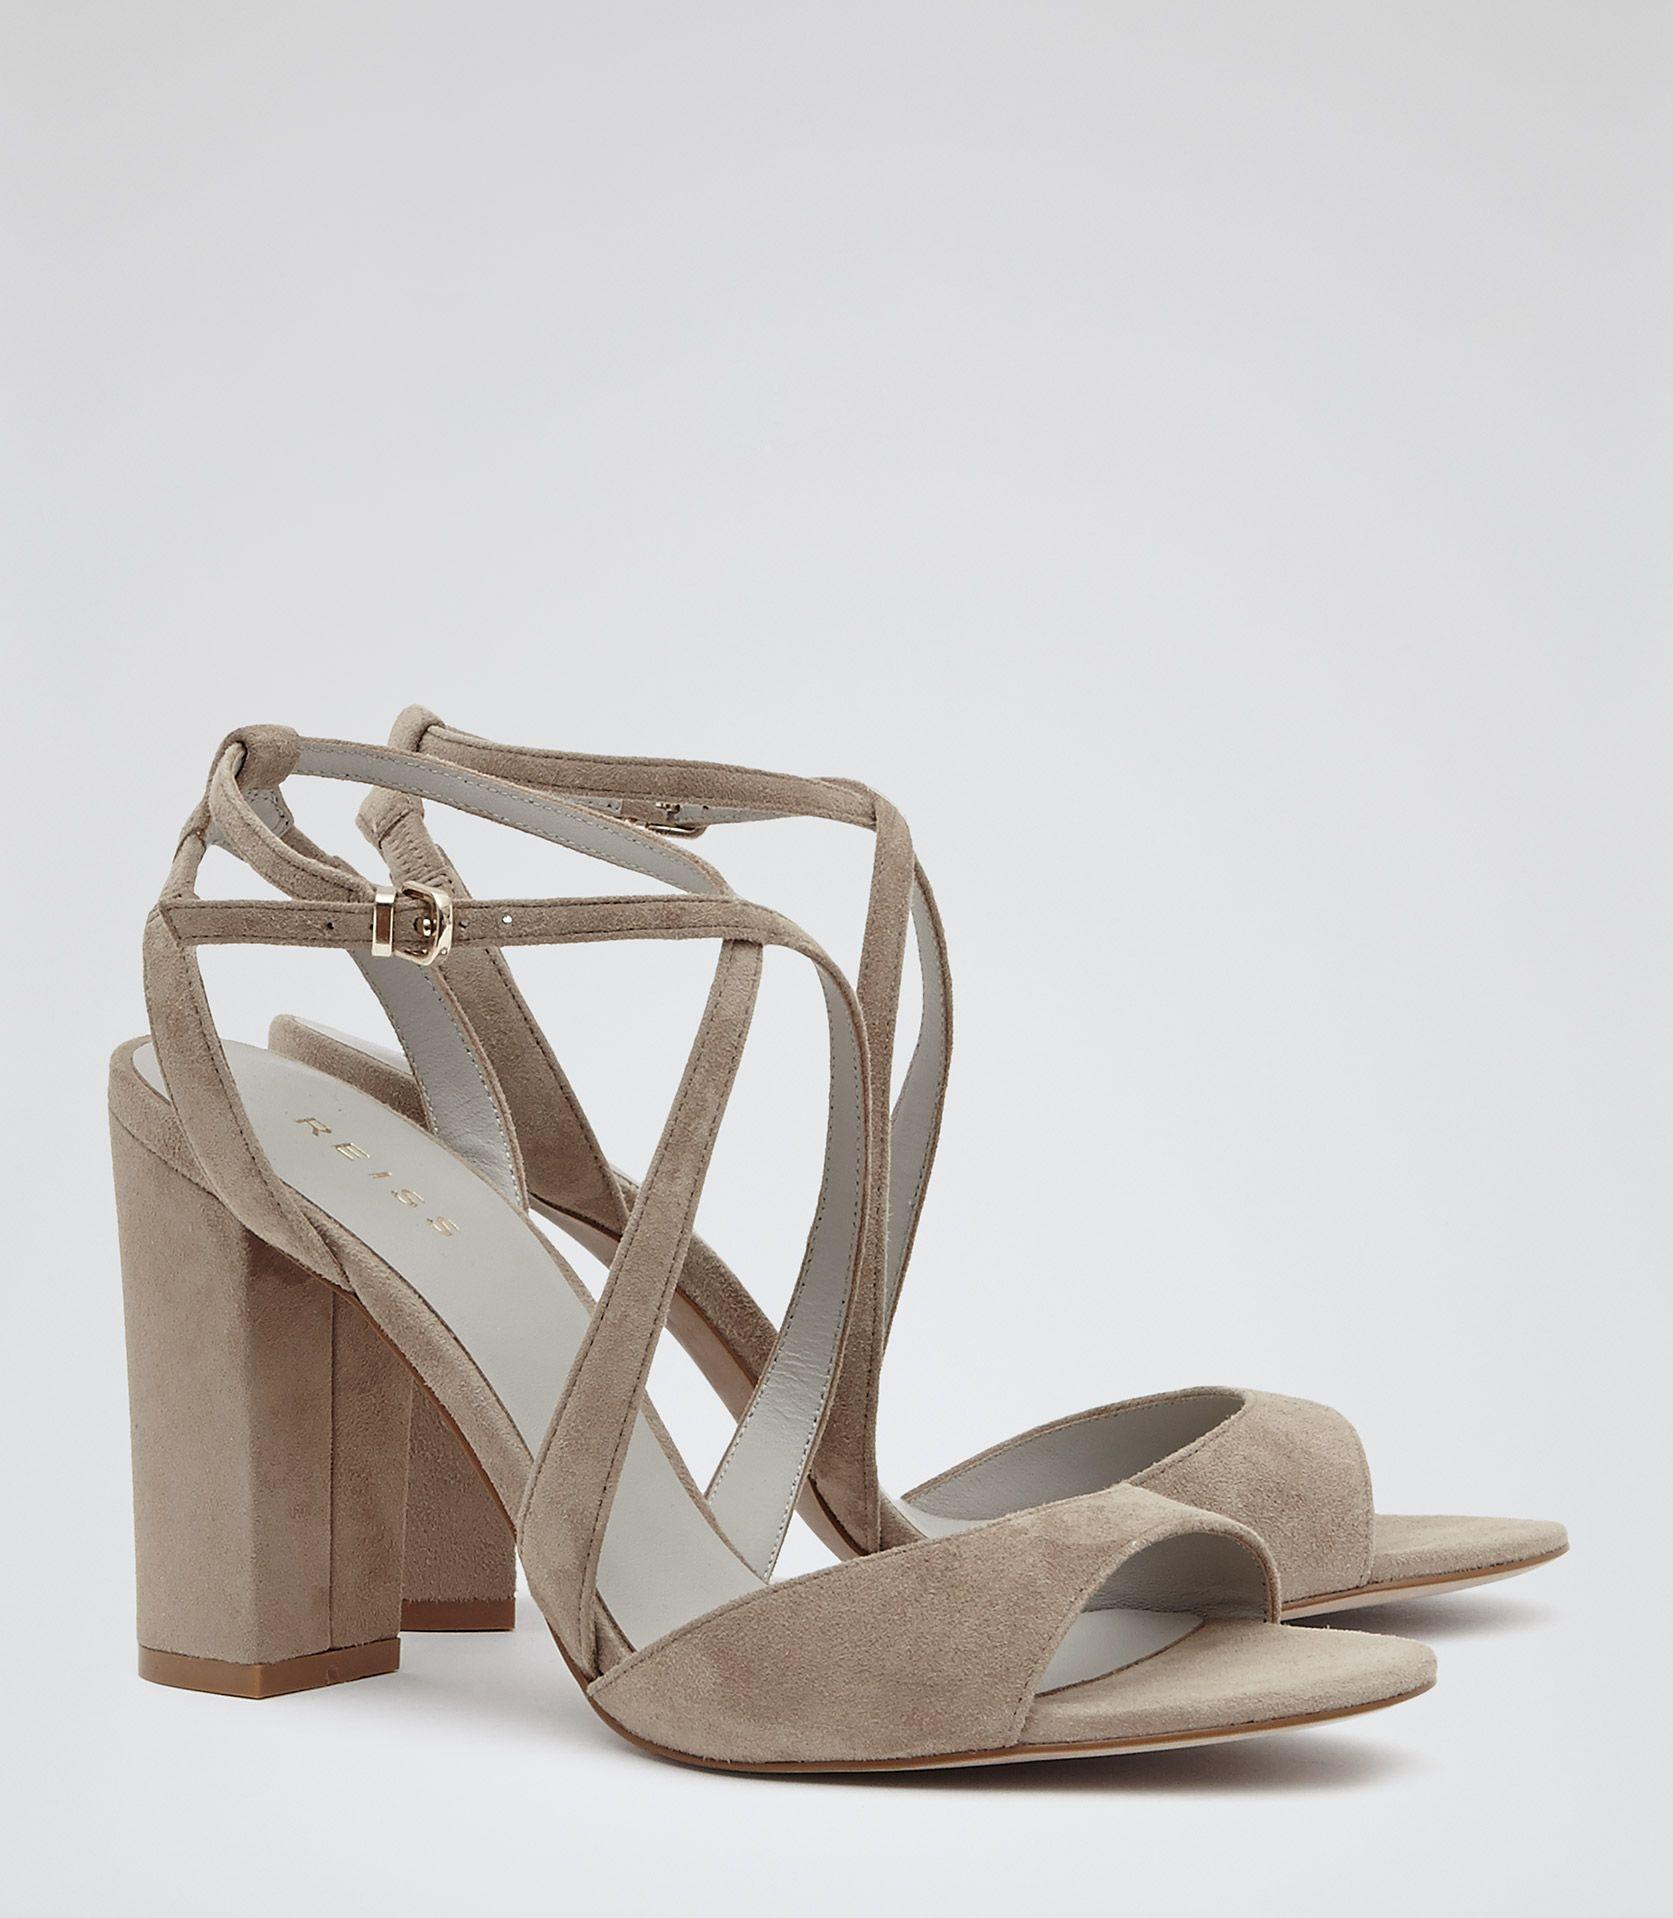 14a5e89e417 Womens Nude Suede Block-heel Sandals - Reiss Jackson